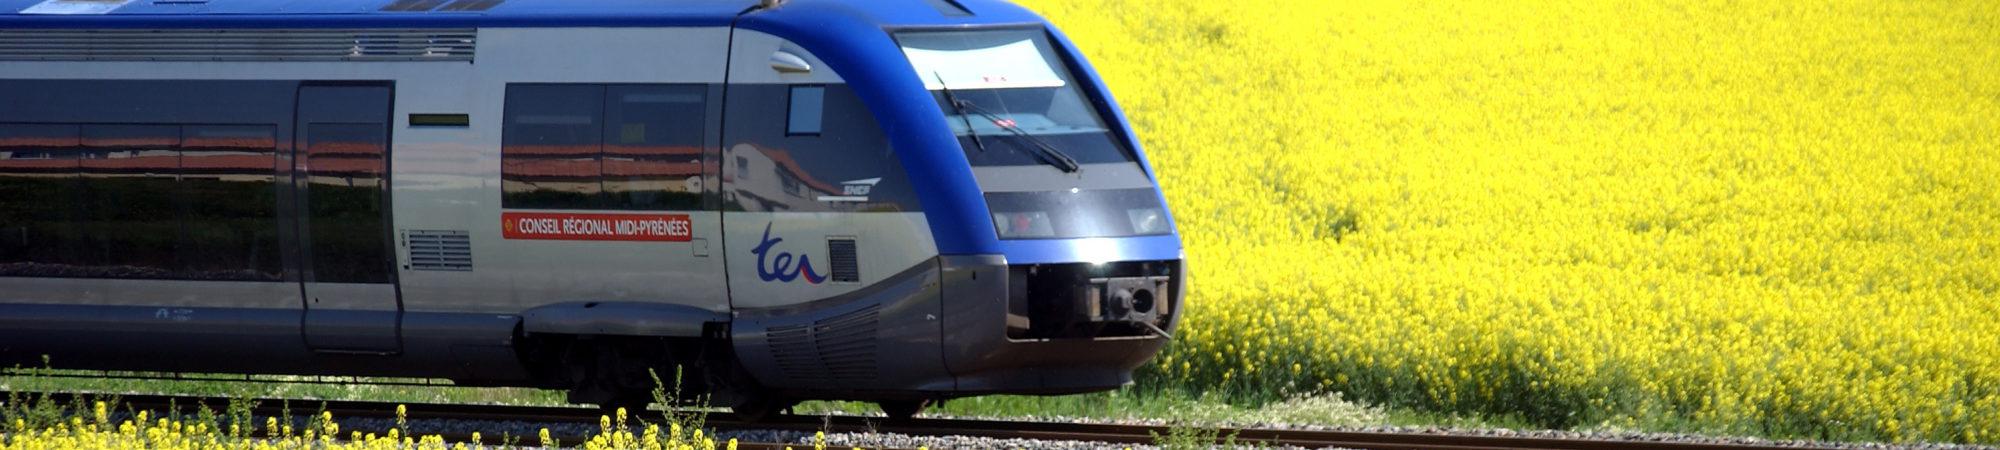 TER Conseil régional Midi-Pyrénées_Crédit David Becus